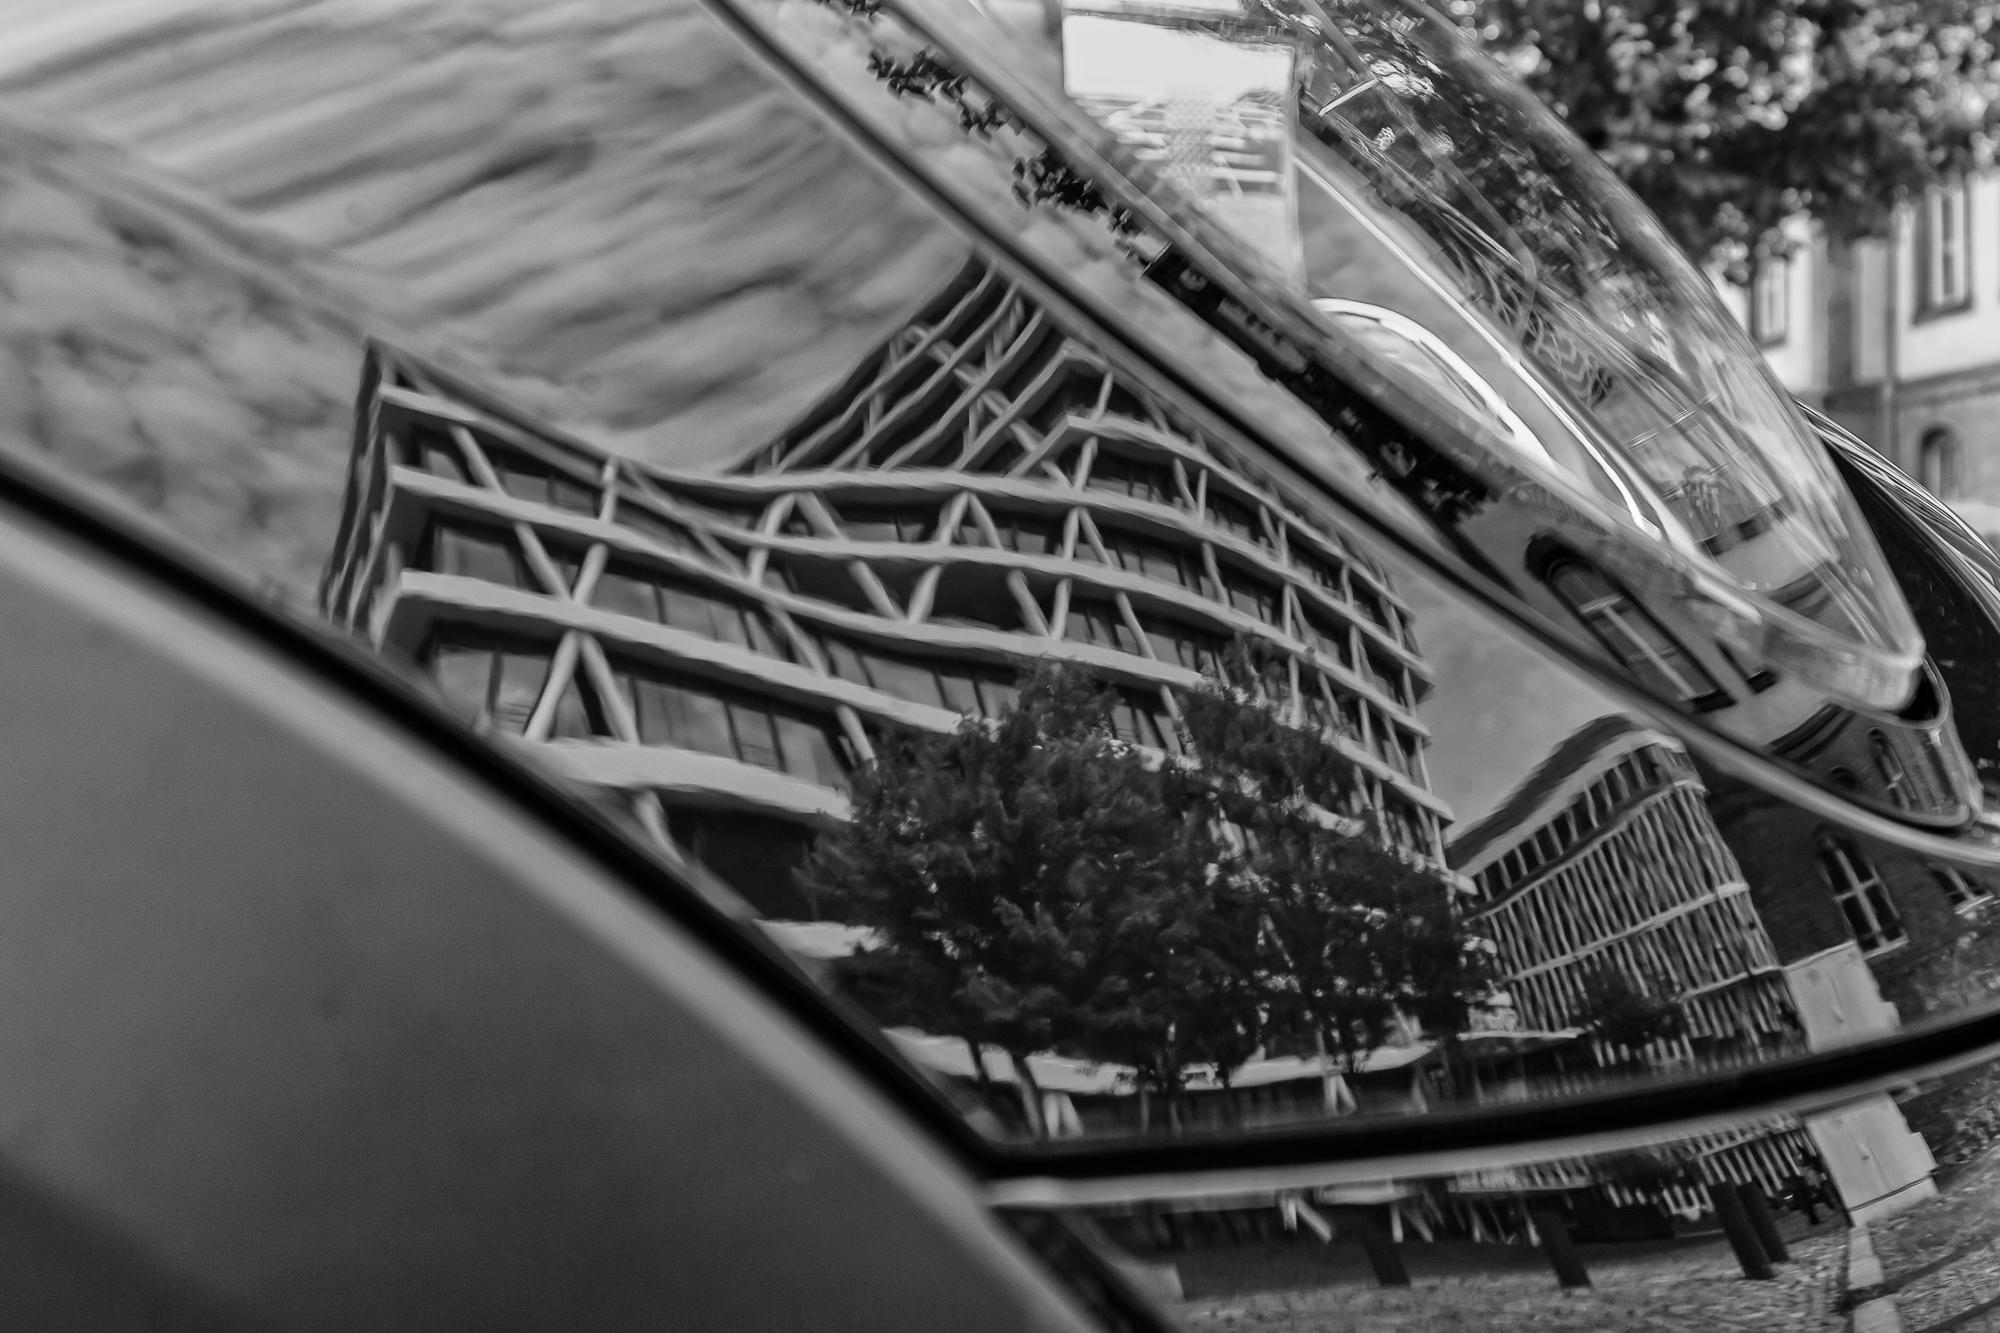 Fotowalk Berlin: 50 Hertz (Spiegelung im Auto)